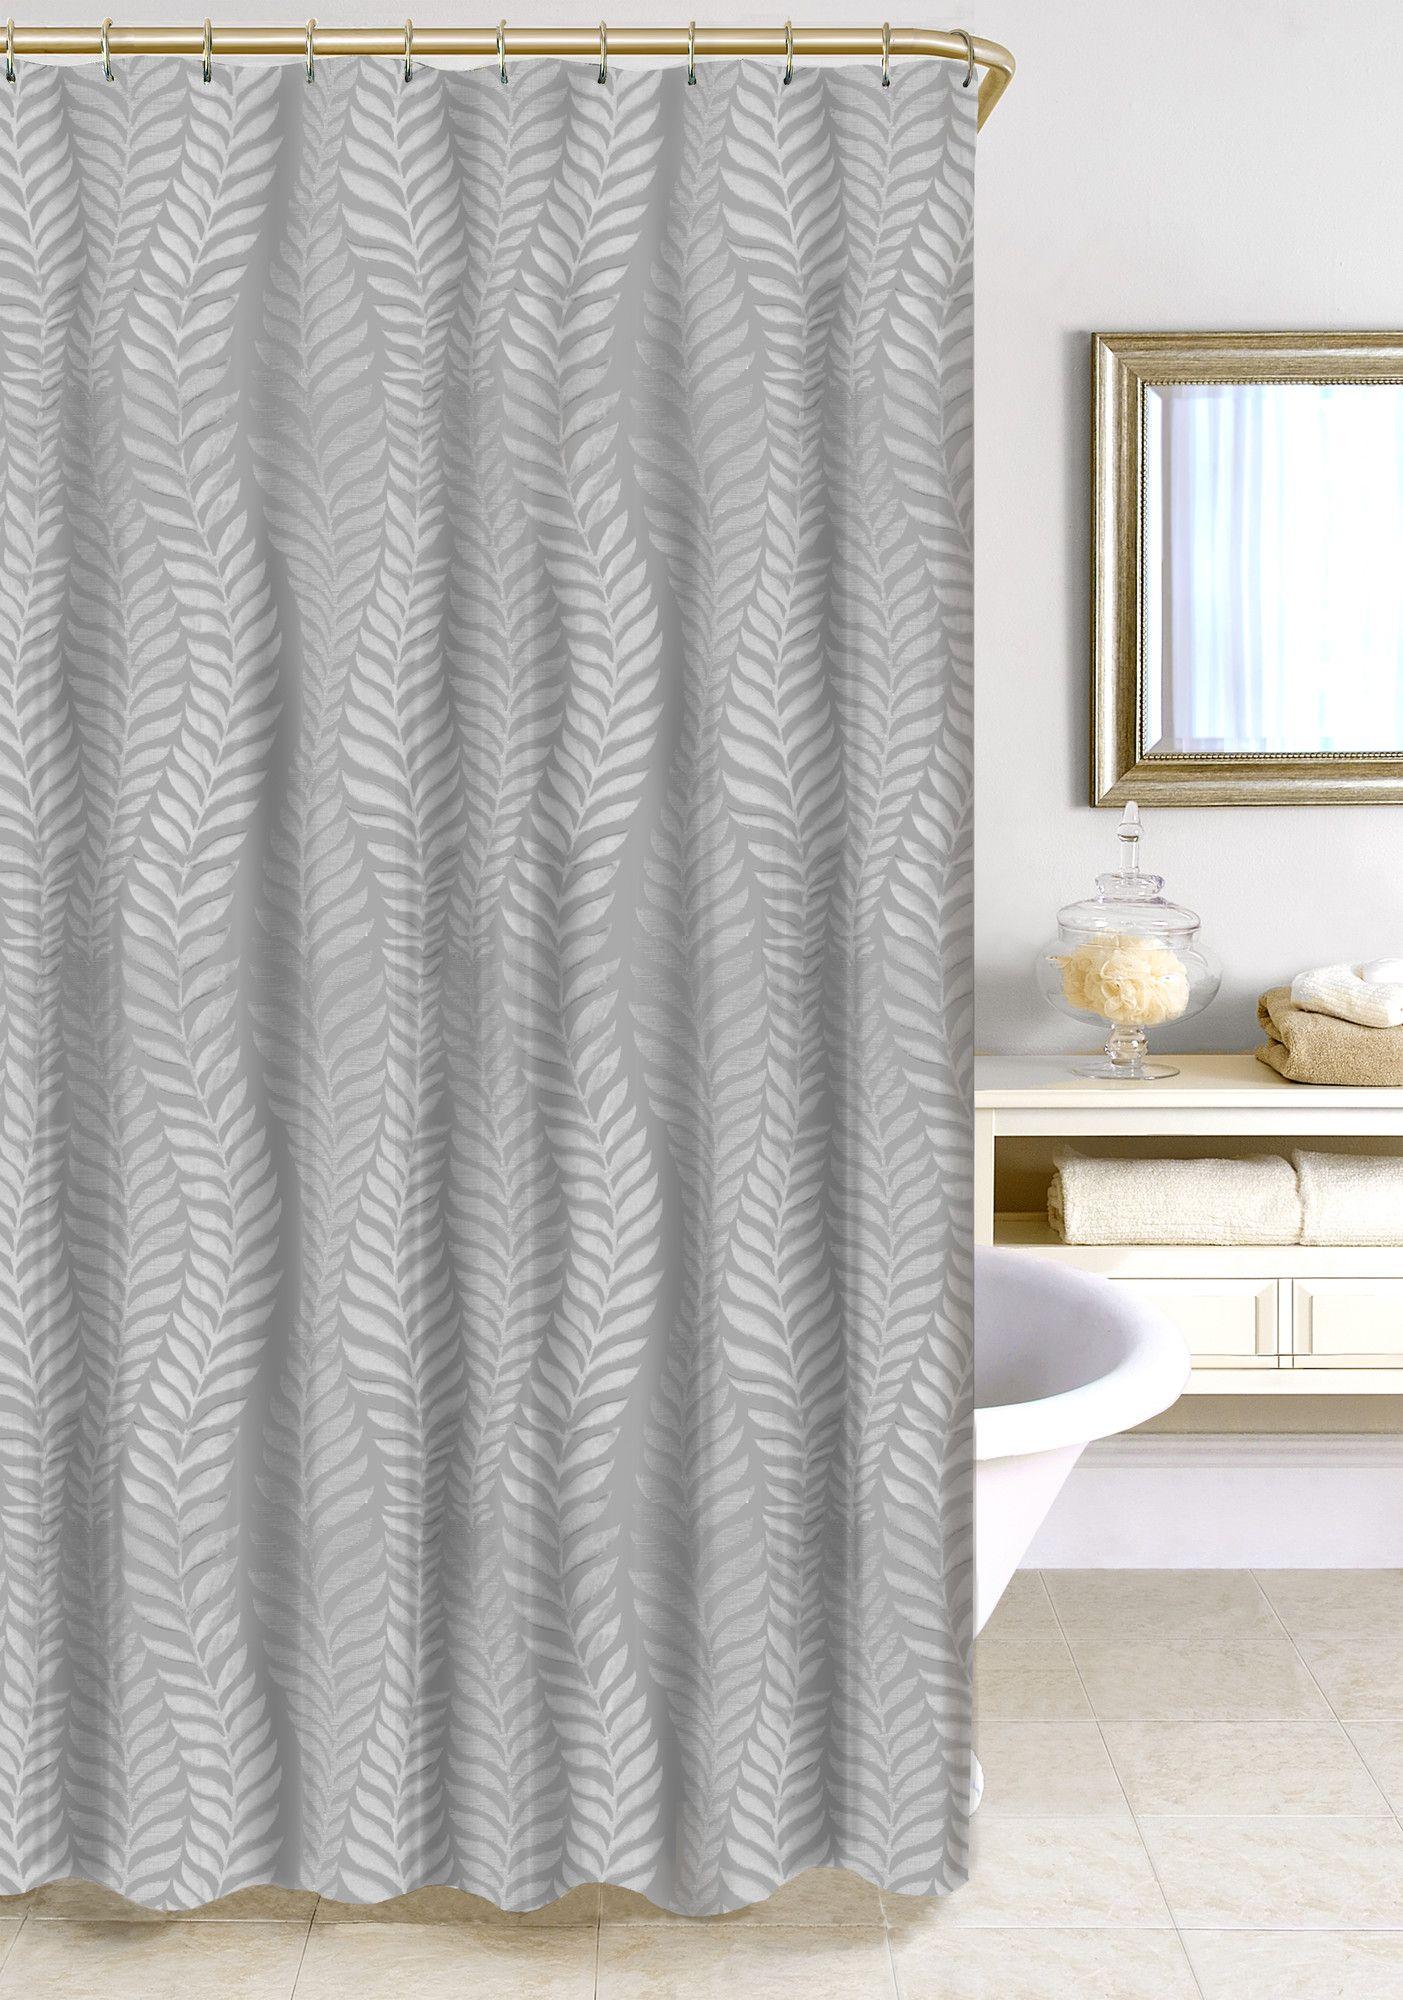 Fern Jacquard Shower Curtain